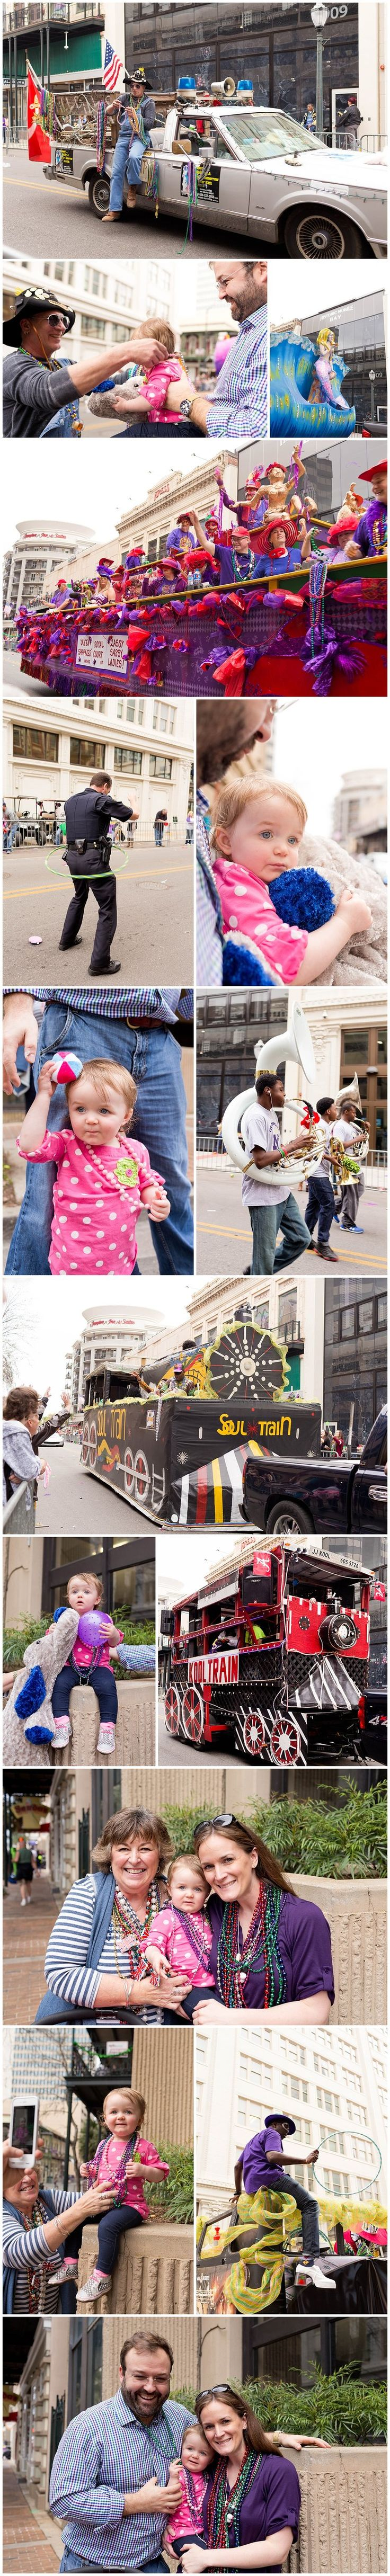 family fun at Mystic DJ Riders Mardi Gras parade (Mobile, Alabama)